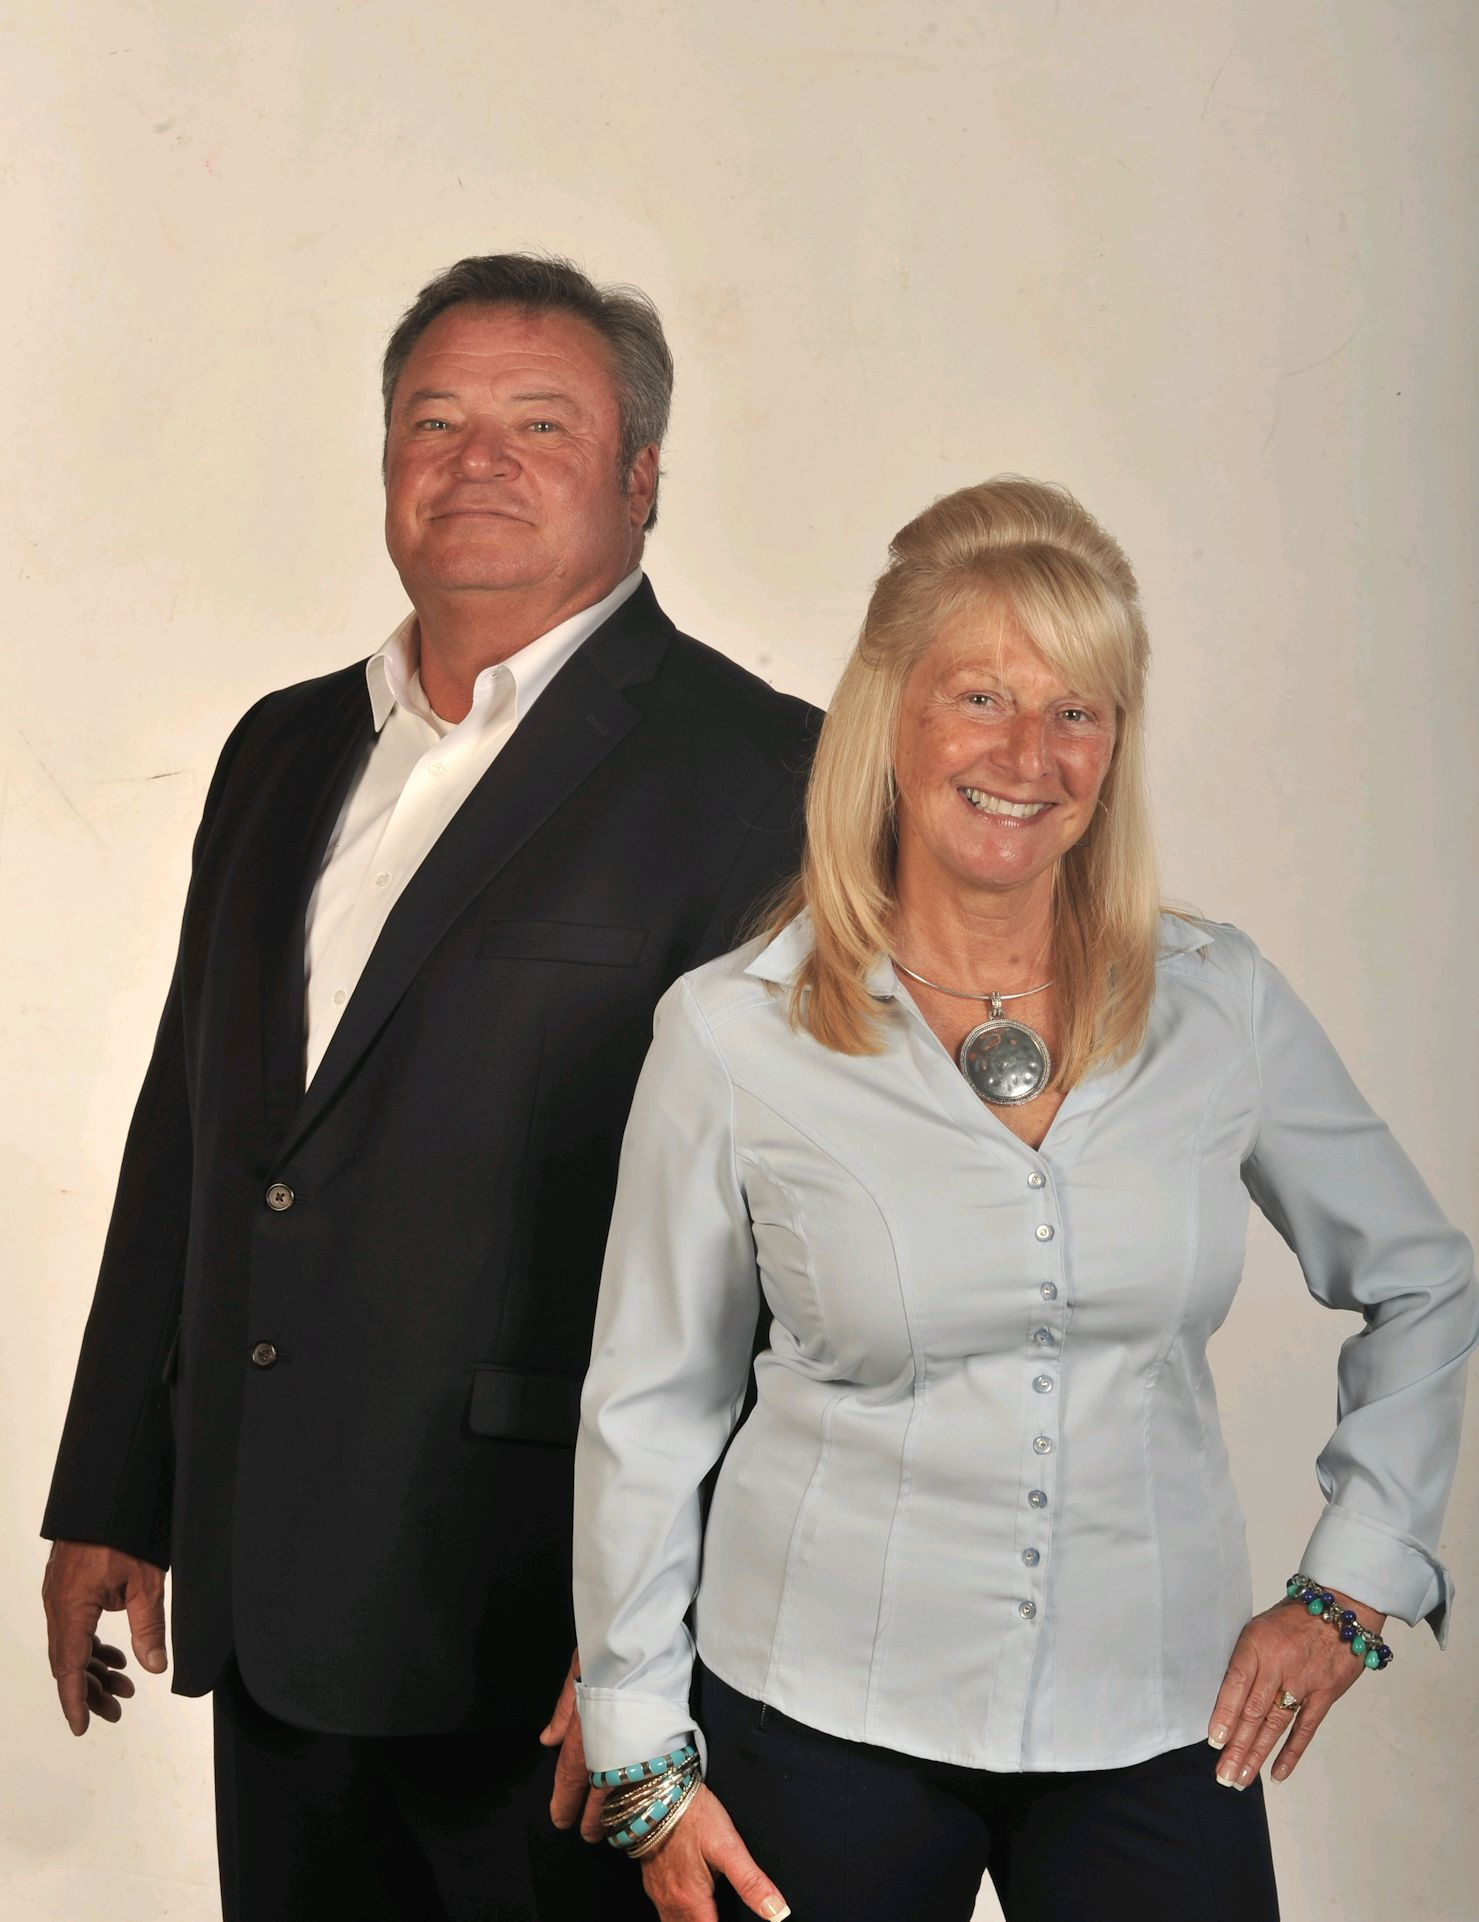 Jan and Jim Theisen